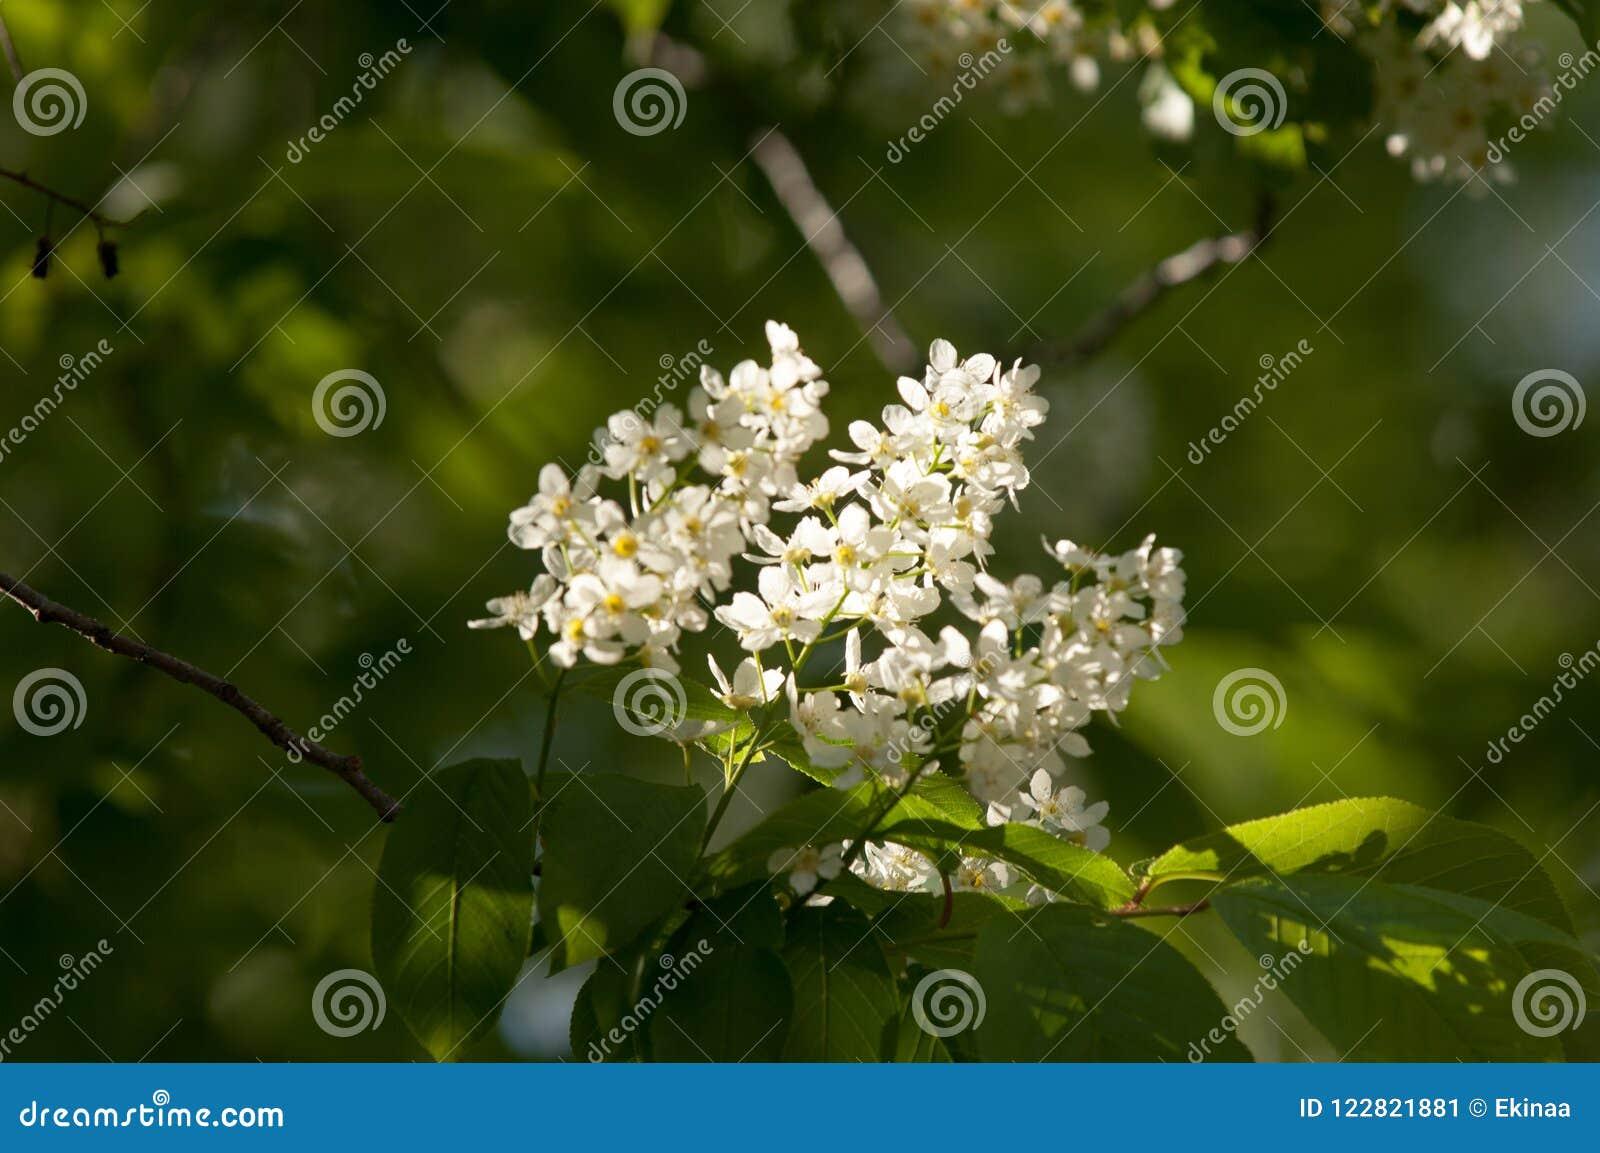 Spring flowers bird spring flowers bird cherry a tree with wh download spring flowers bird spring flowers bird cherry a tree with wh stock mightylinksfo